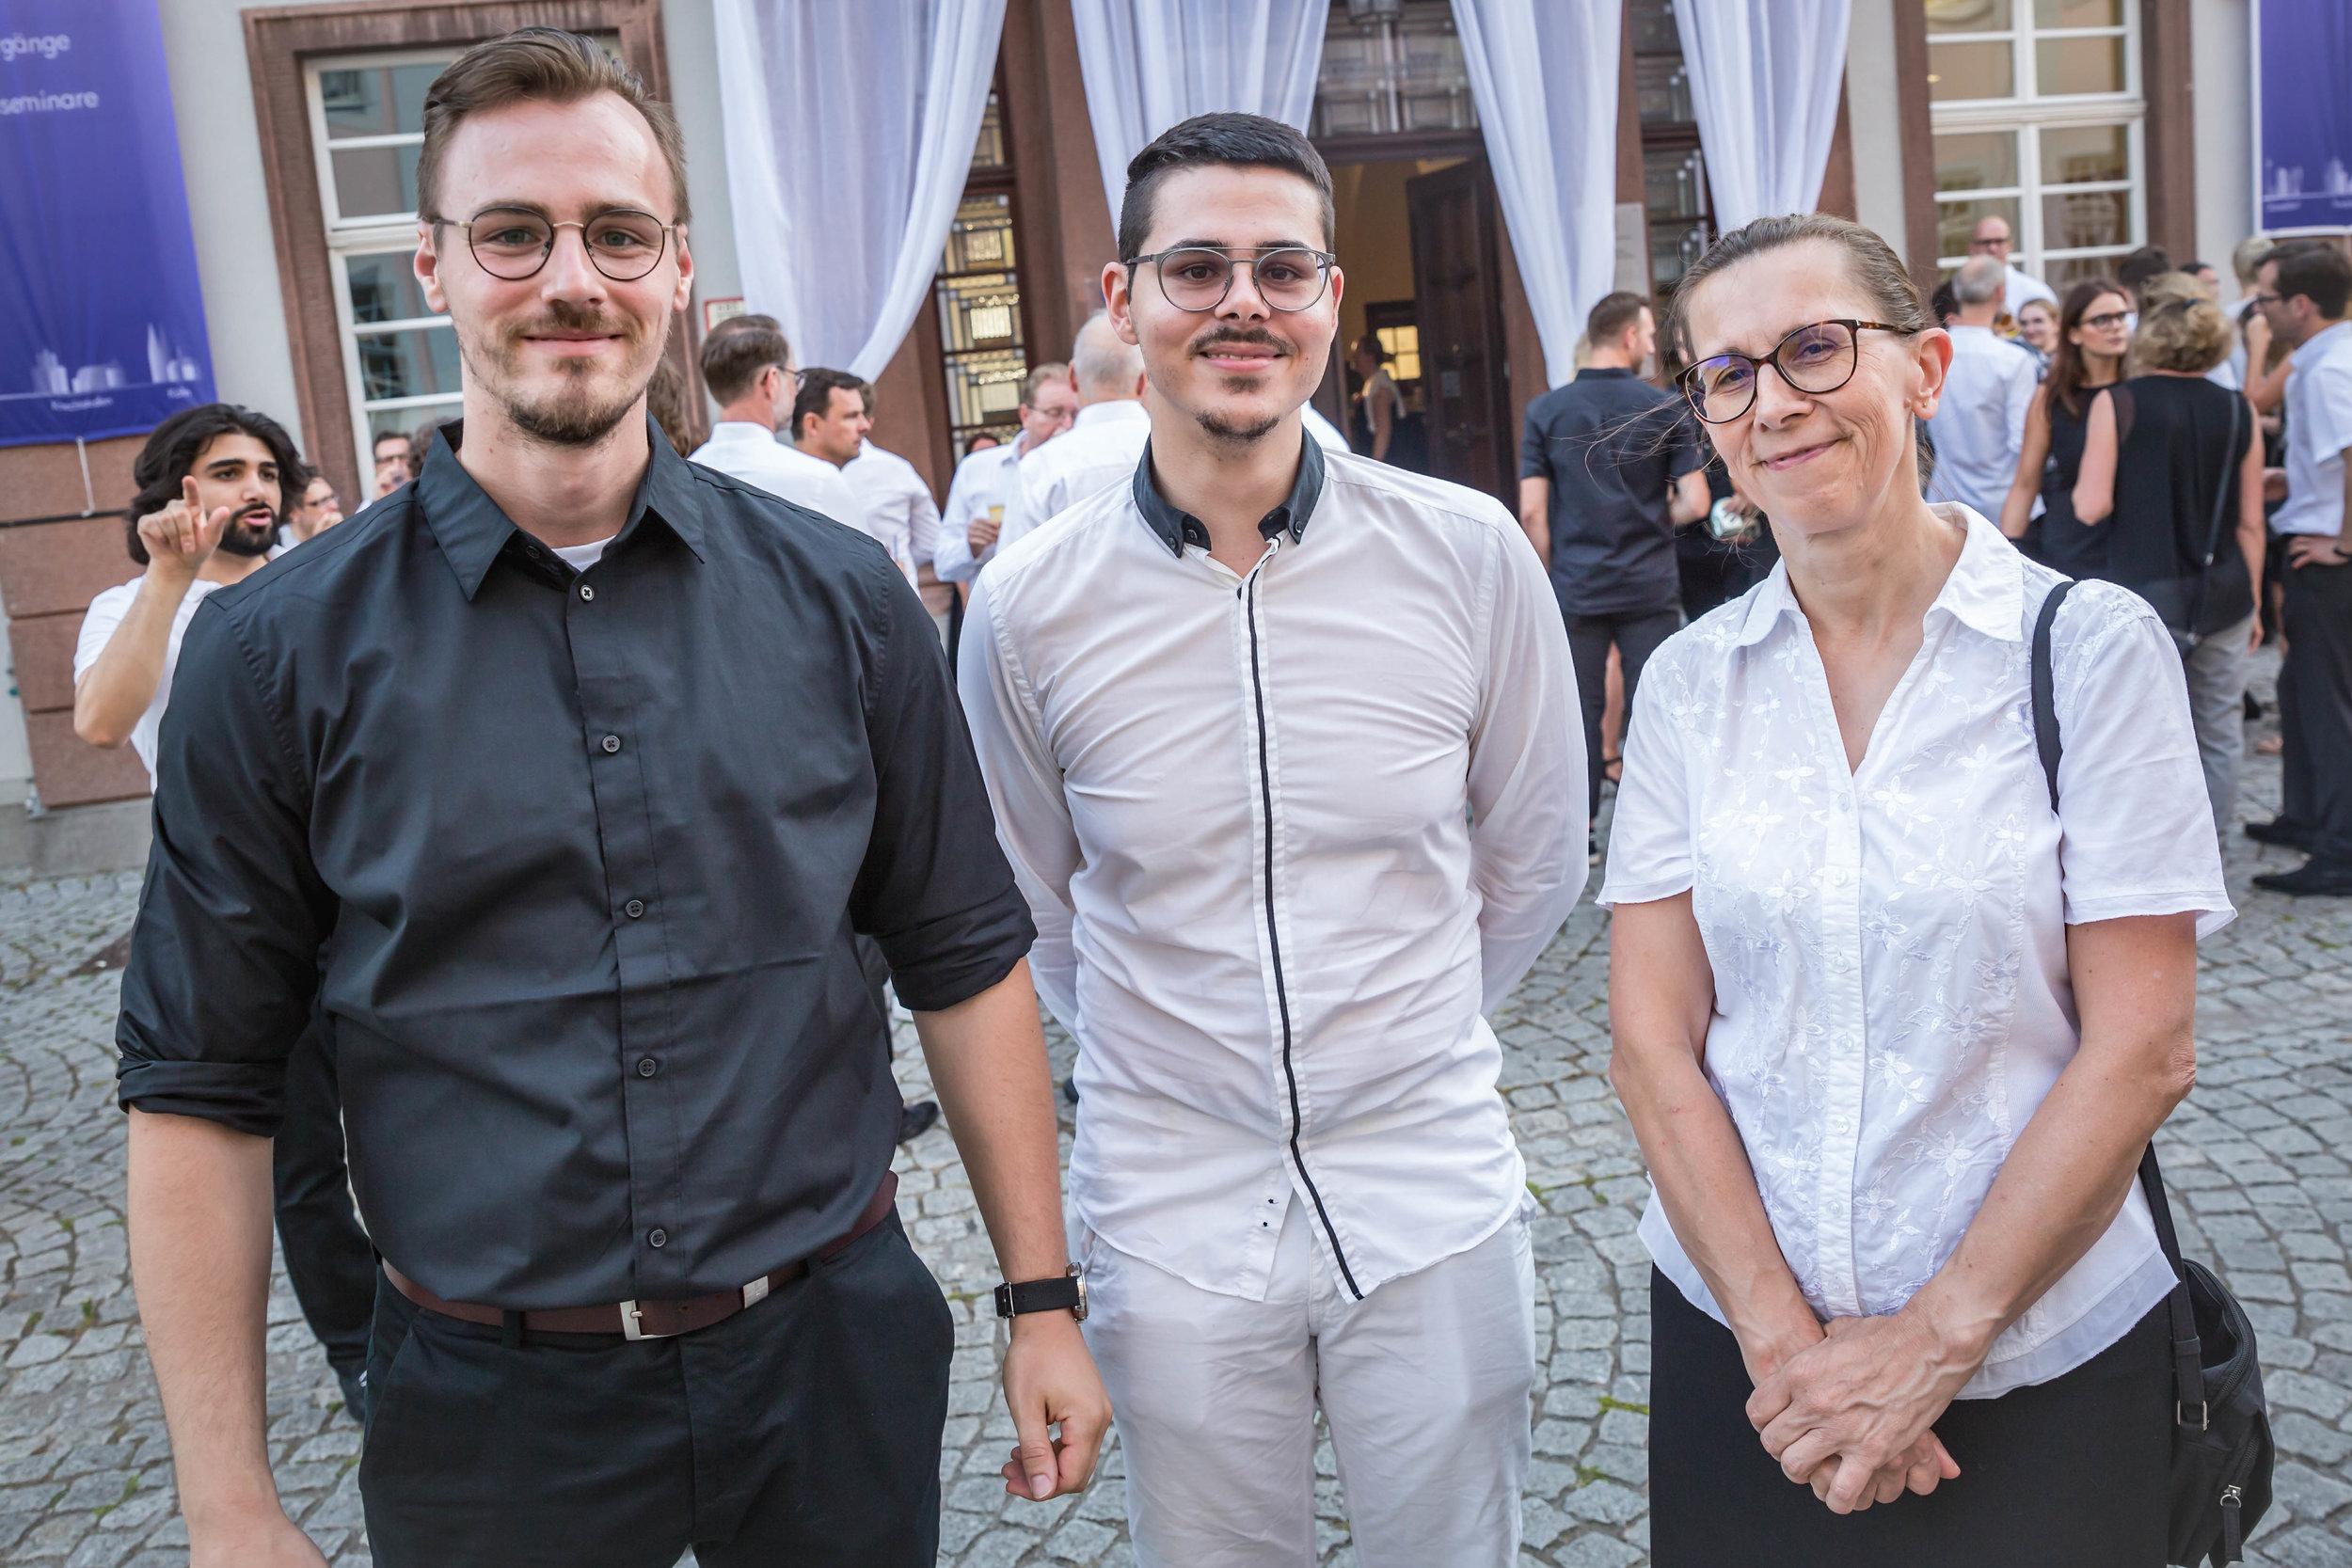 20190626_Akademie_40-jähriges_Jubiläum_FB_kl-5311886.jpg